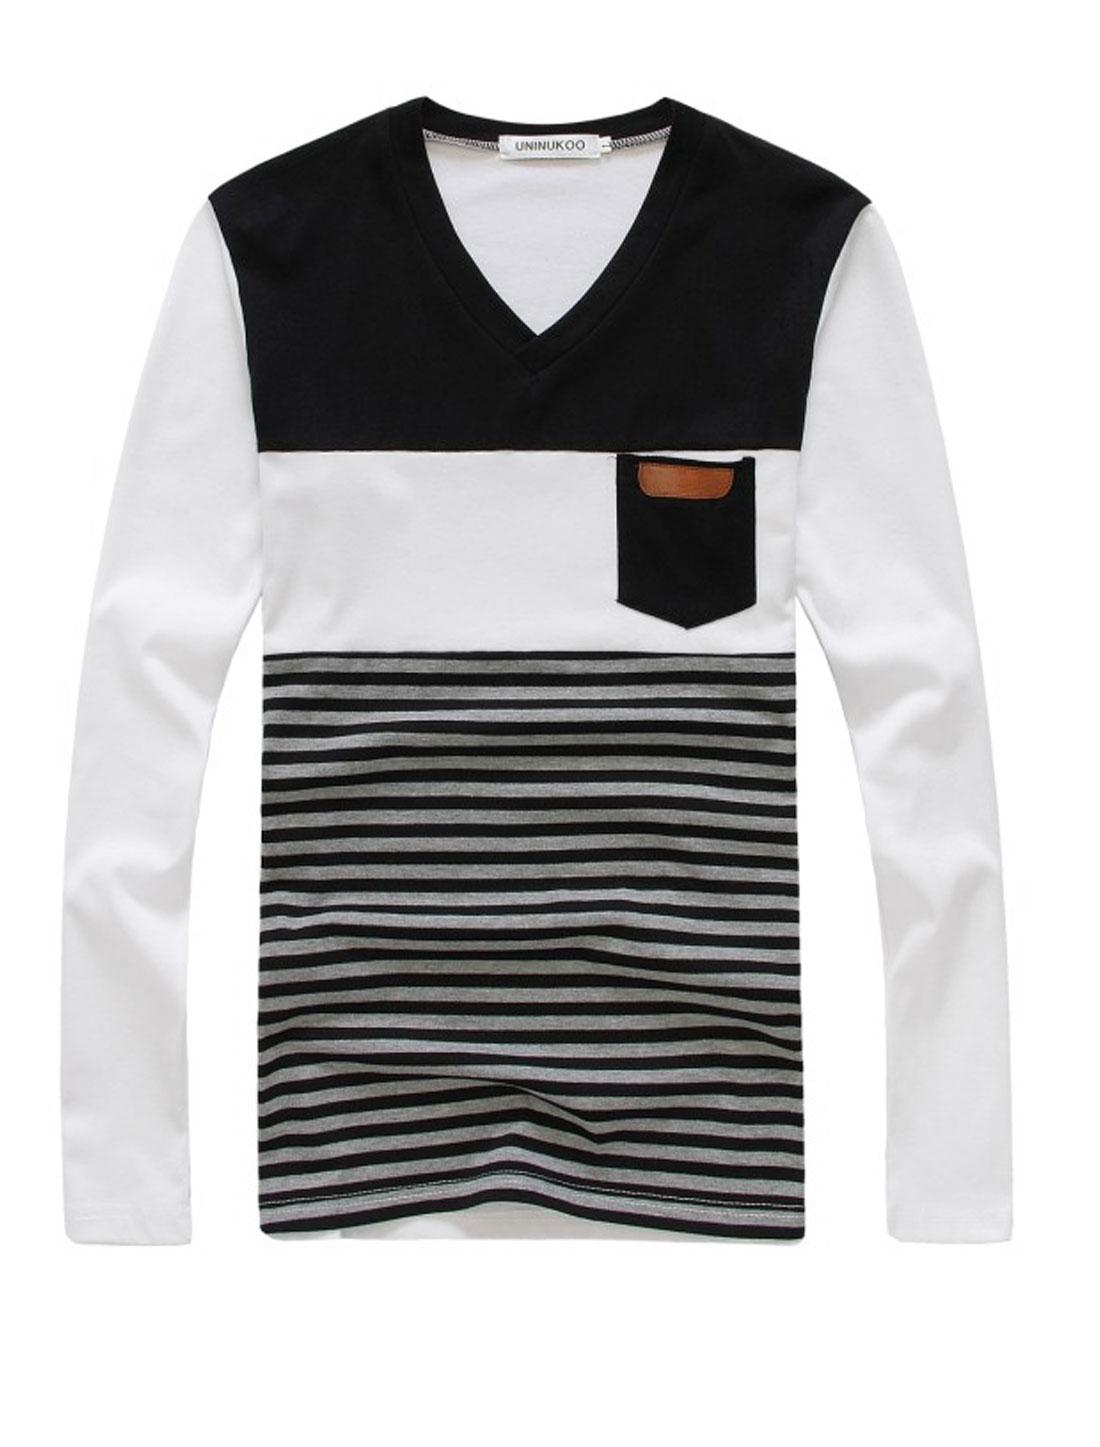 Men V Neck Colorblock Stripes Pattern Trendy Slim Tee Black M